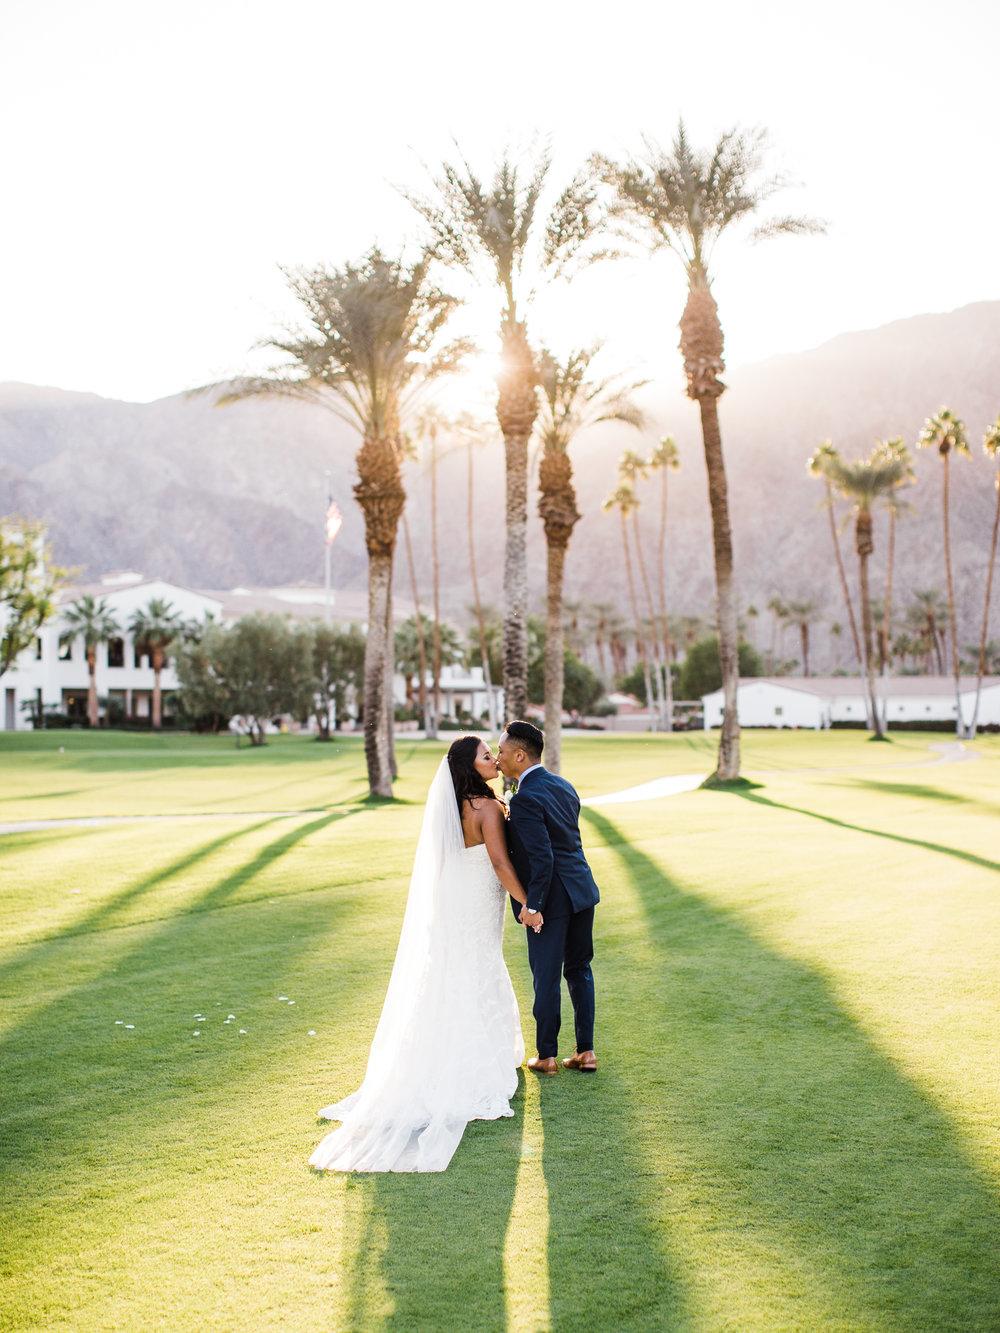 Czarina-and-Cedric-Wedding-La-Quinta-Brandon-J-Ferlin-Photography-366.jpg